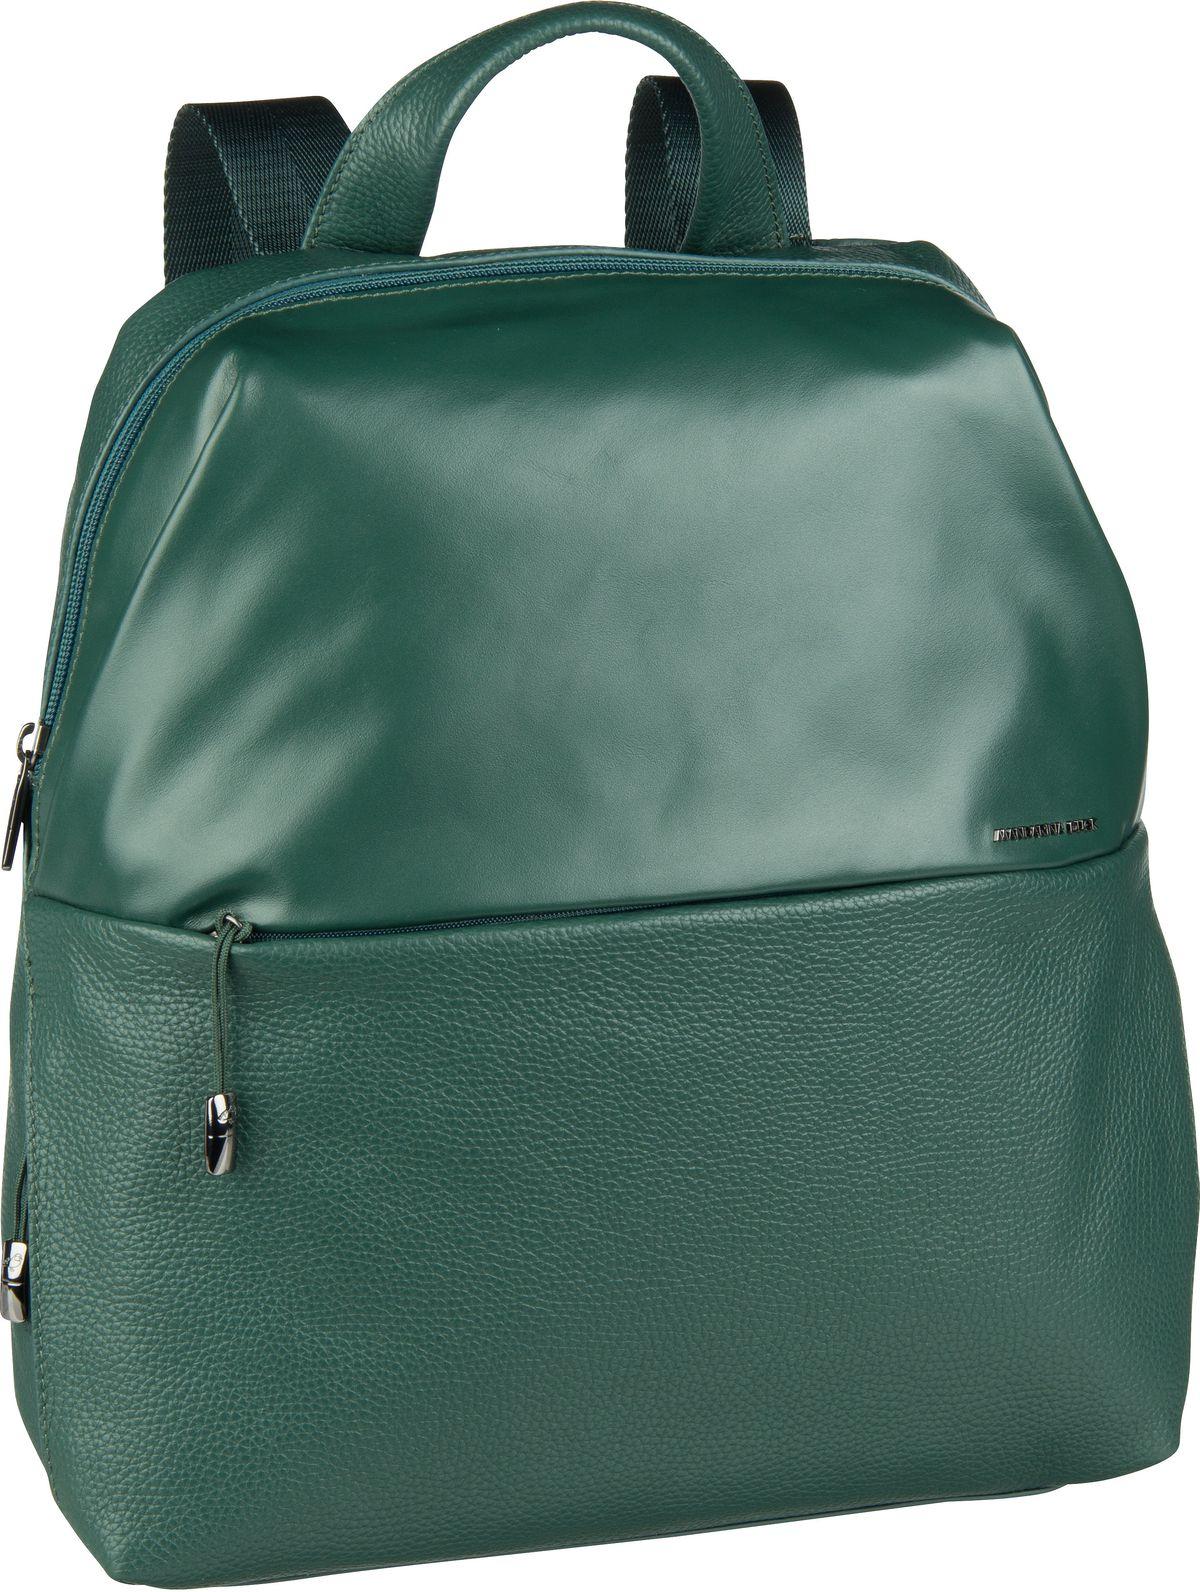 Rucksack / Daypack Athena Backpack UPT10 Petrolio